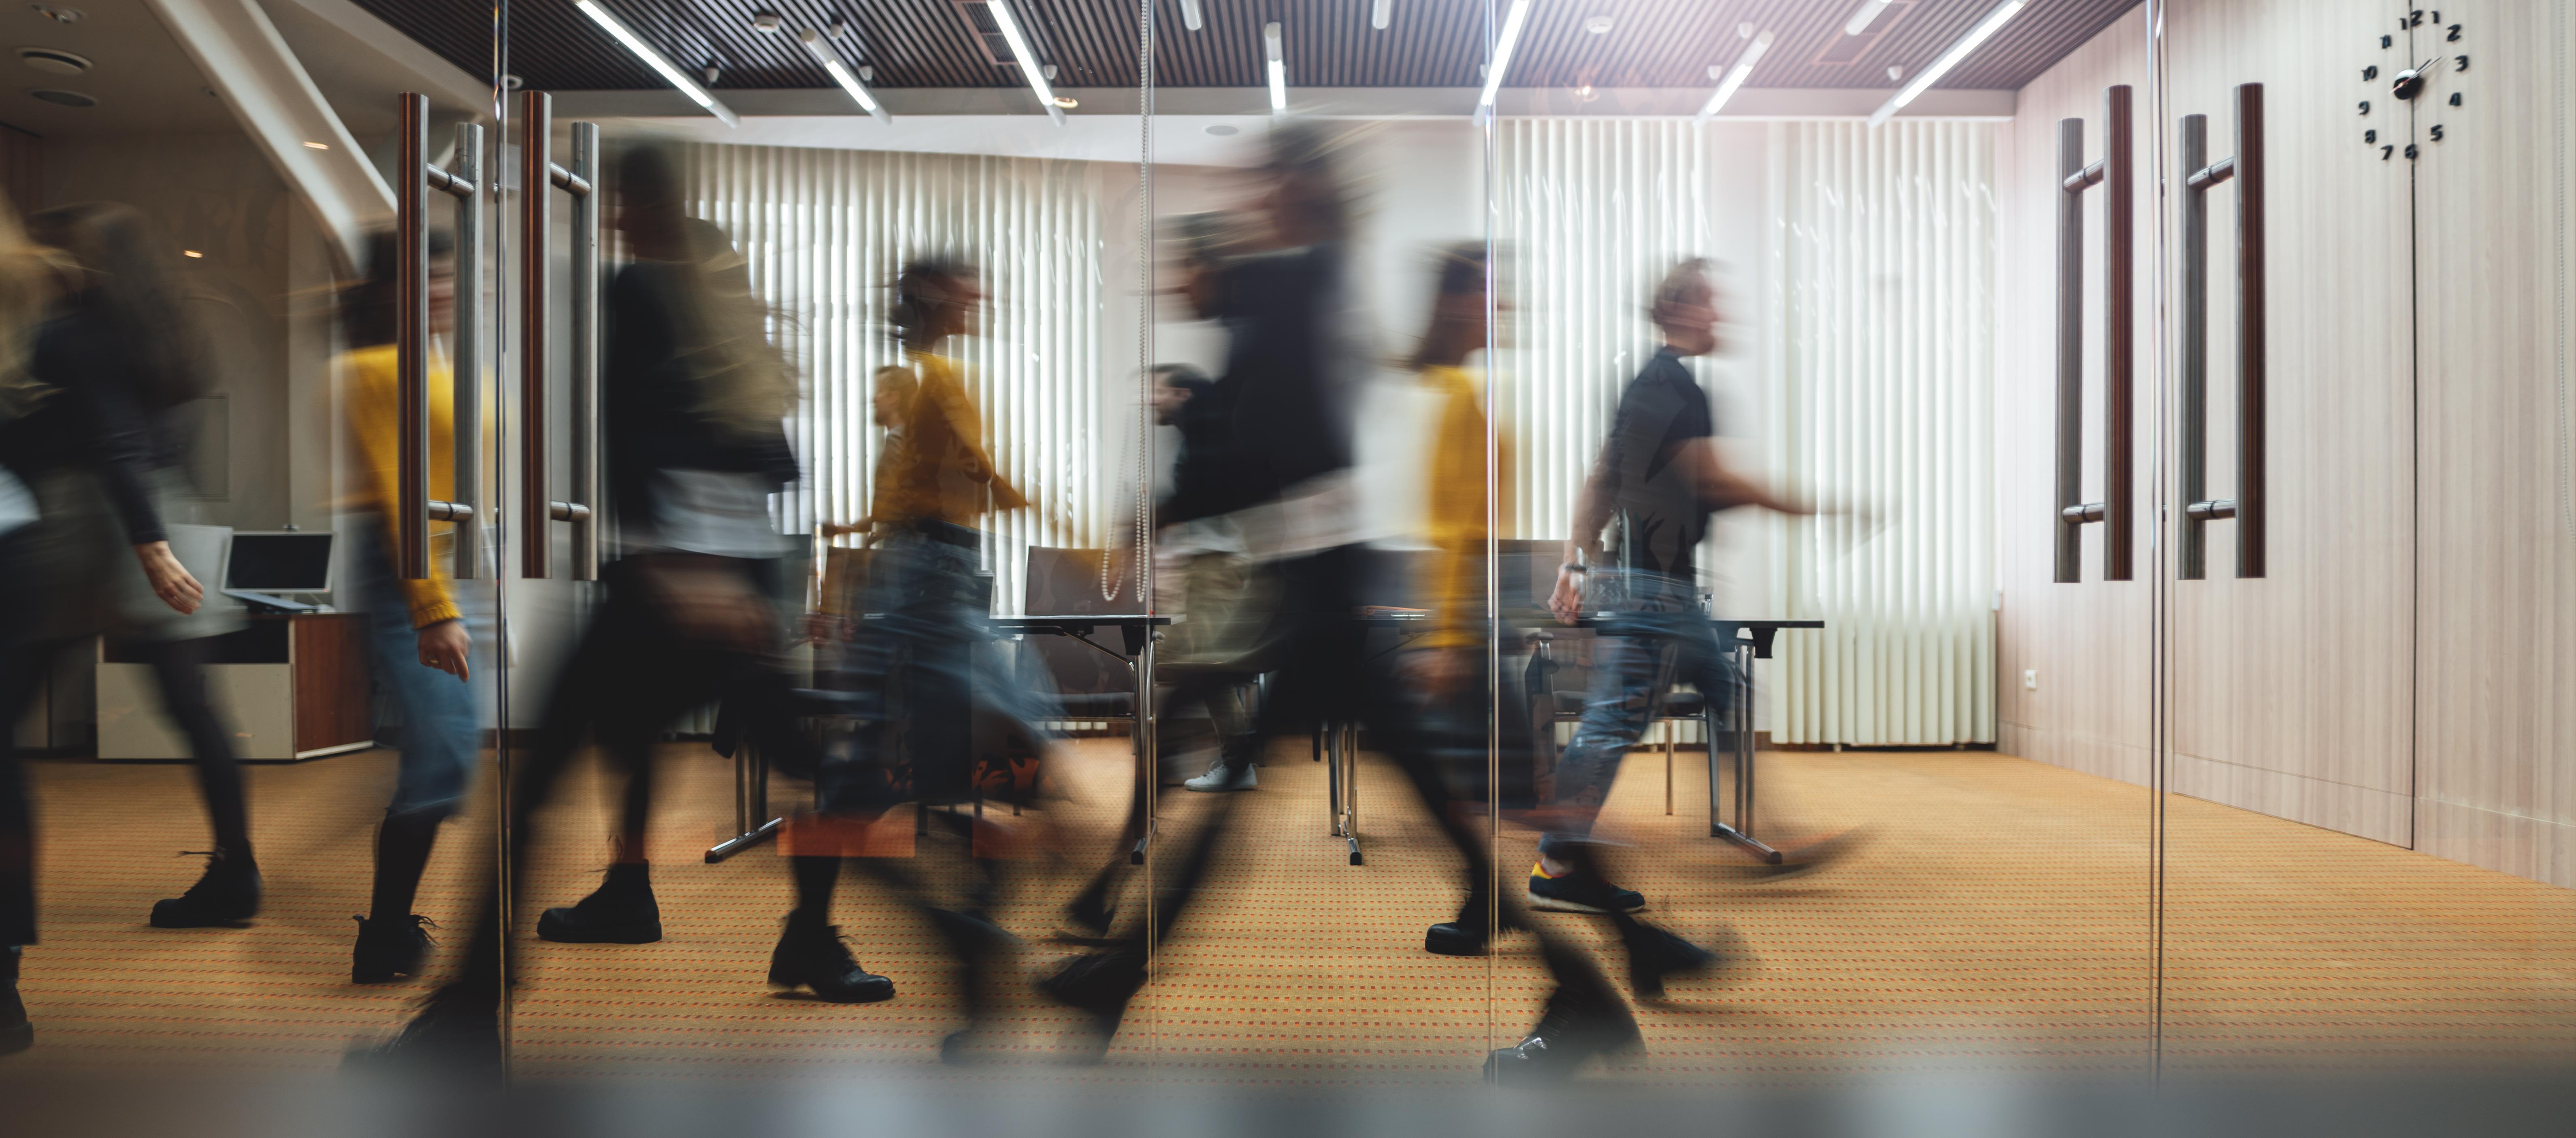 MediaWorks和新西兰有毒的工作文化的问题——为什么人力资源不能解决所有问题